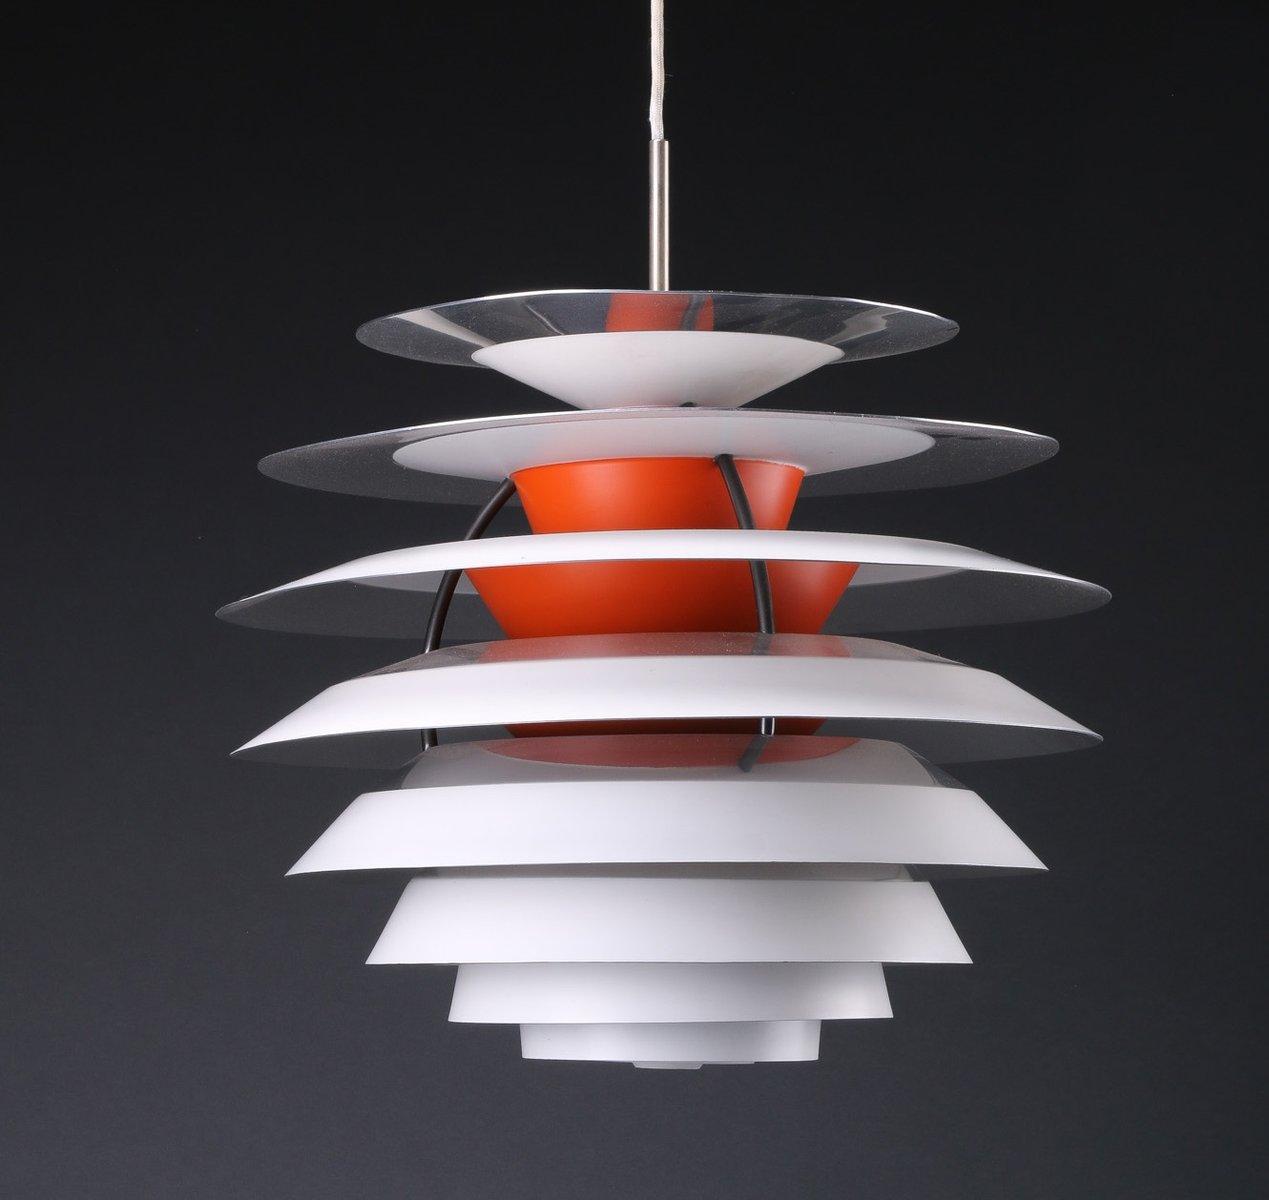 ph kontrast lampe von poul henningsen f r louis poulsen 1960er bei pamono kaufen. Black Bedroom Furniture Sets. Home Design Ideas